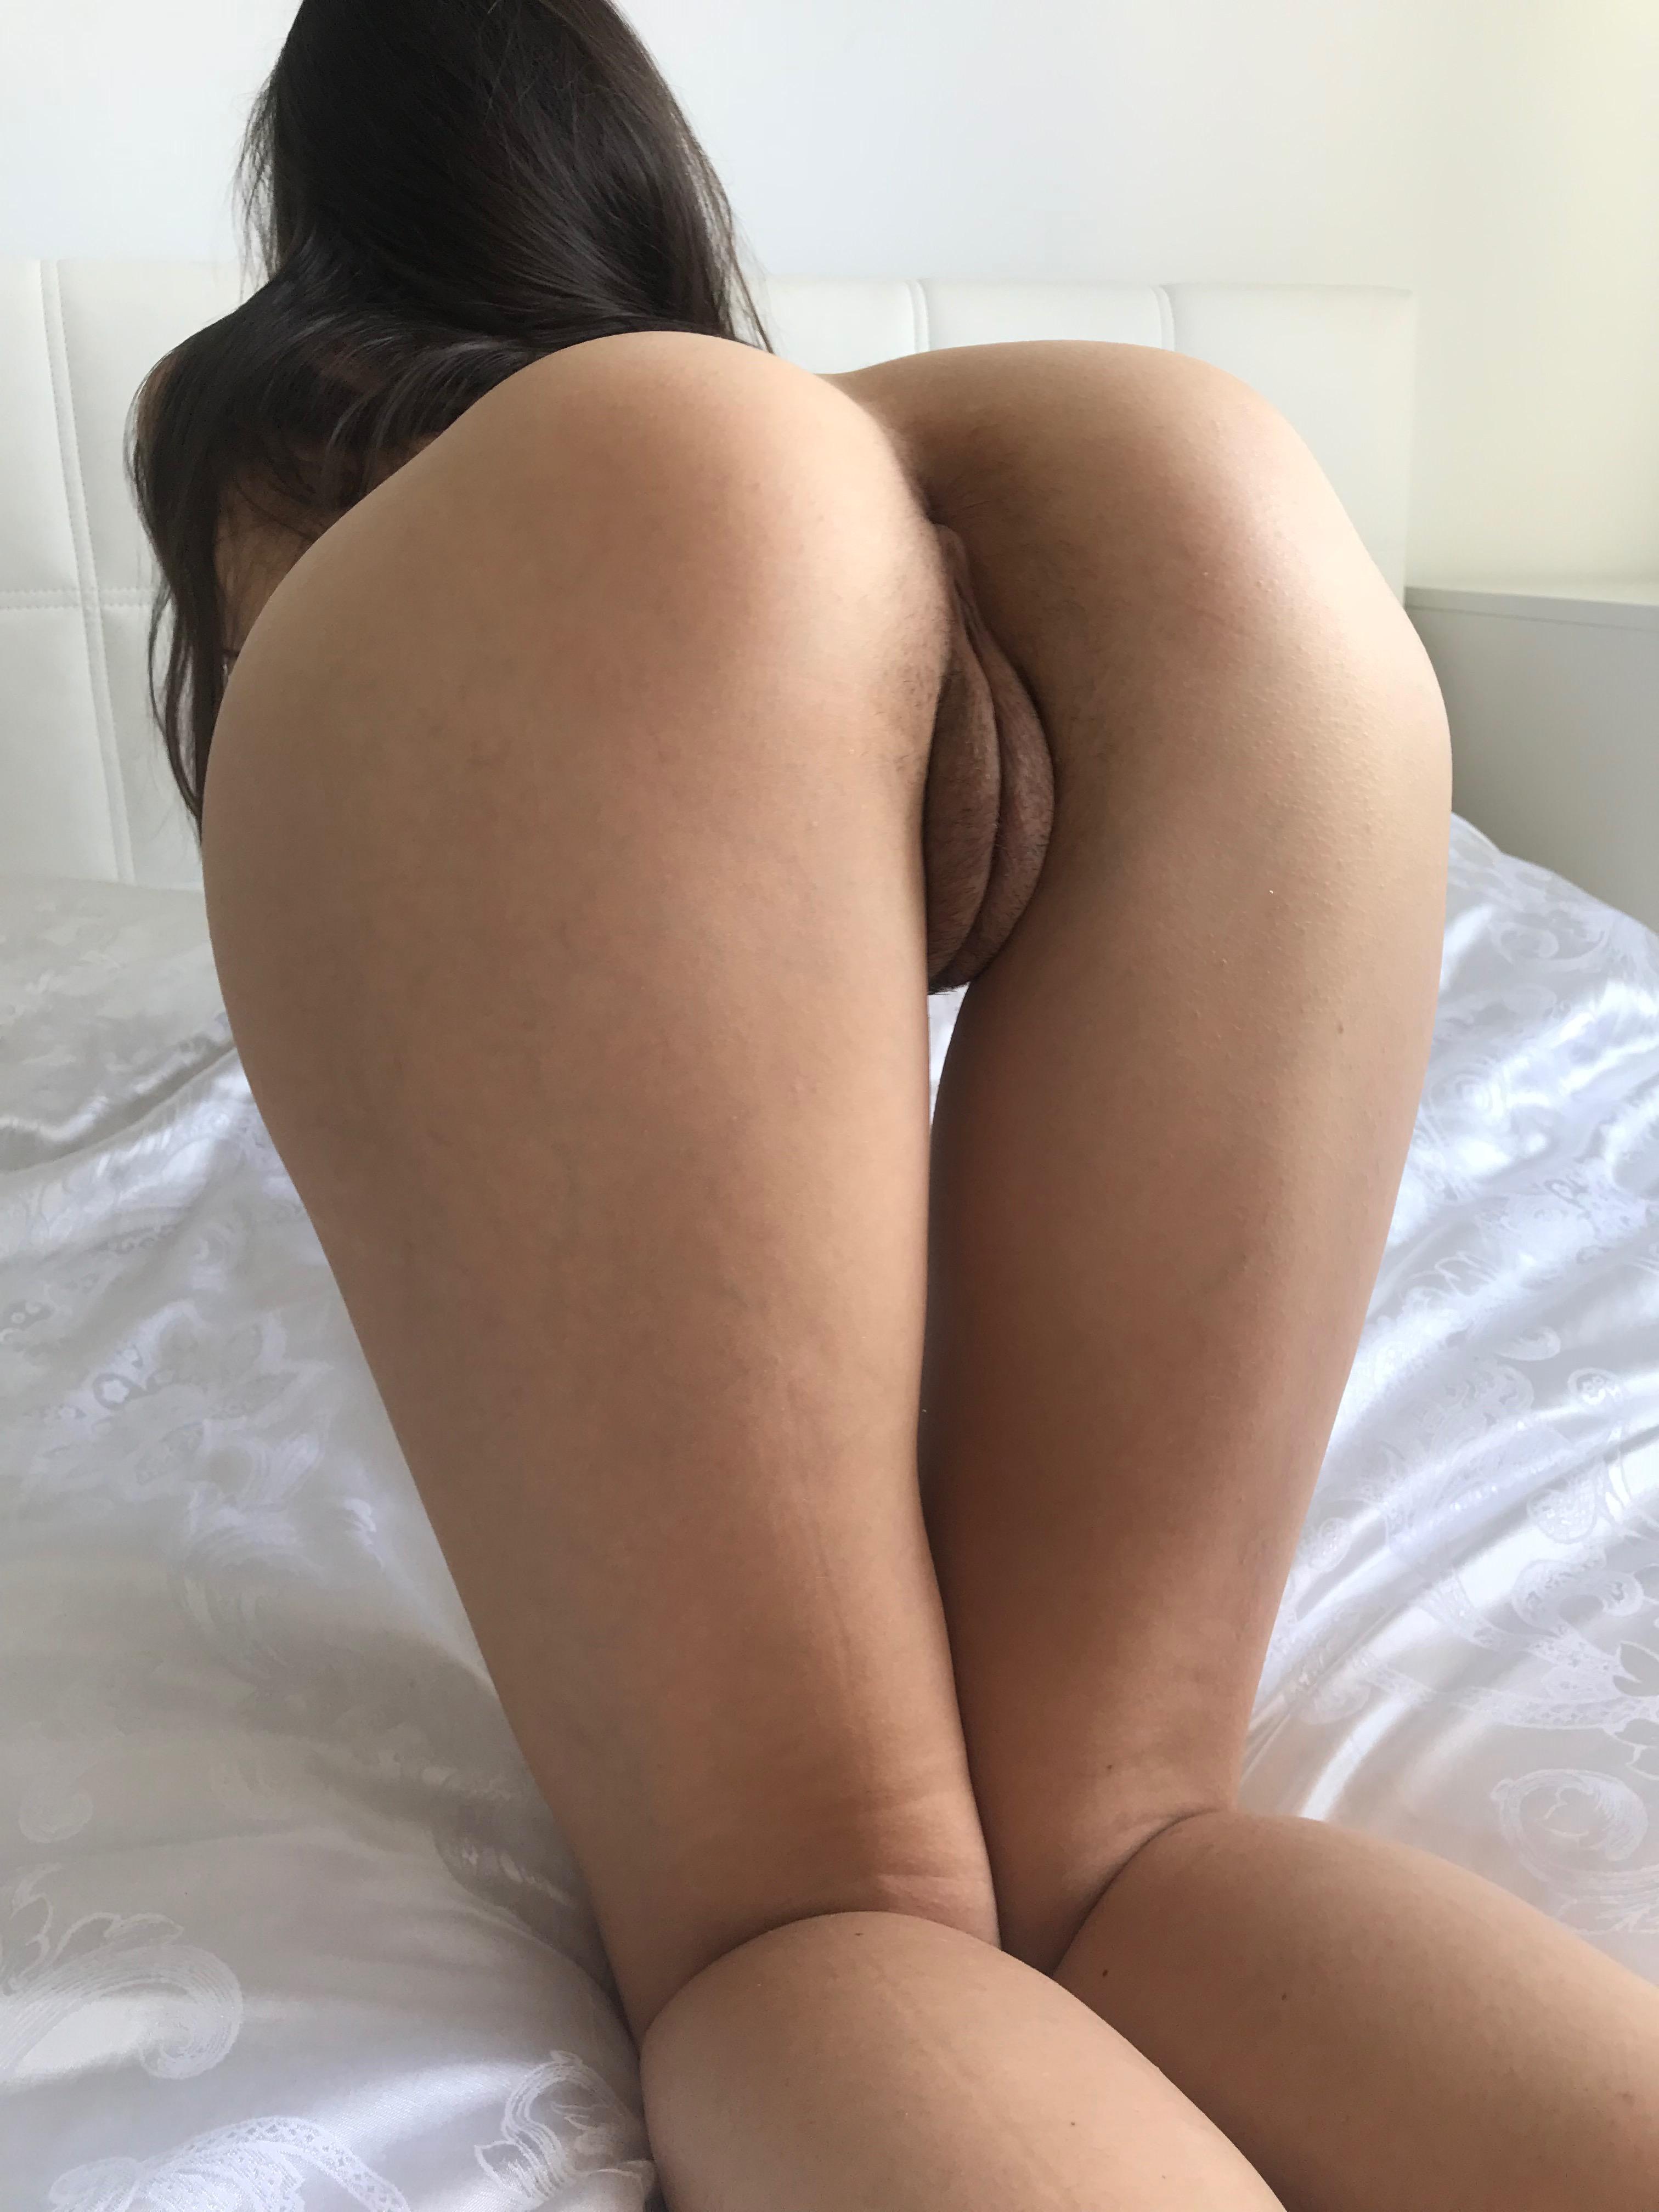 Gwyneth paltrow naked pussy upskirt